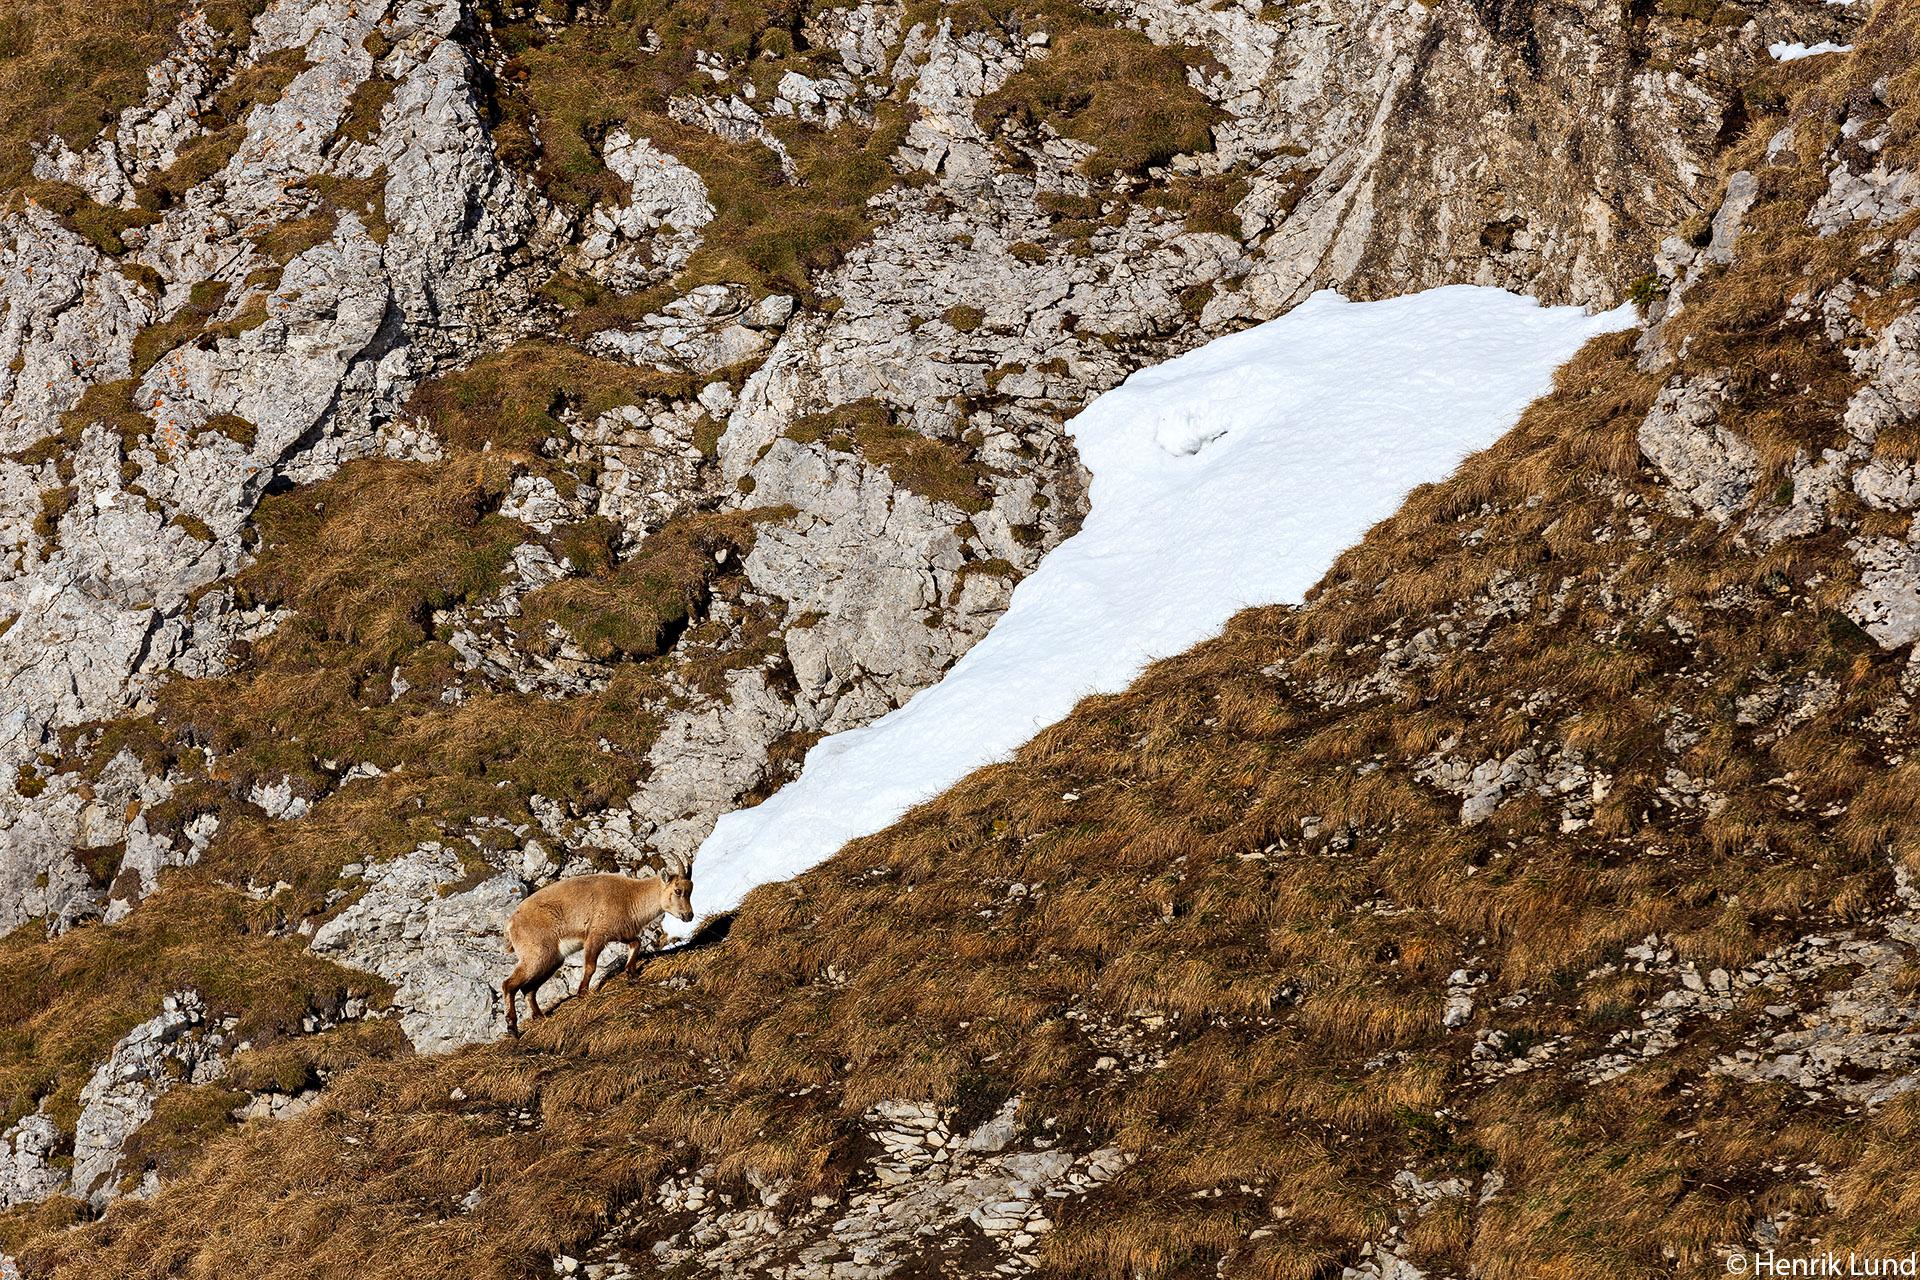 Alpine ibex on the mountain wall of Pilatus, Lucerne, Switzerland. April 2018.